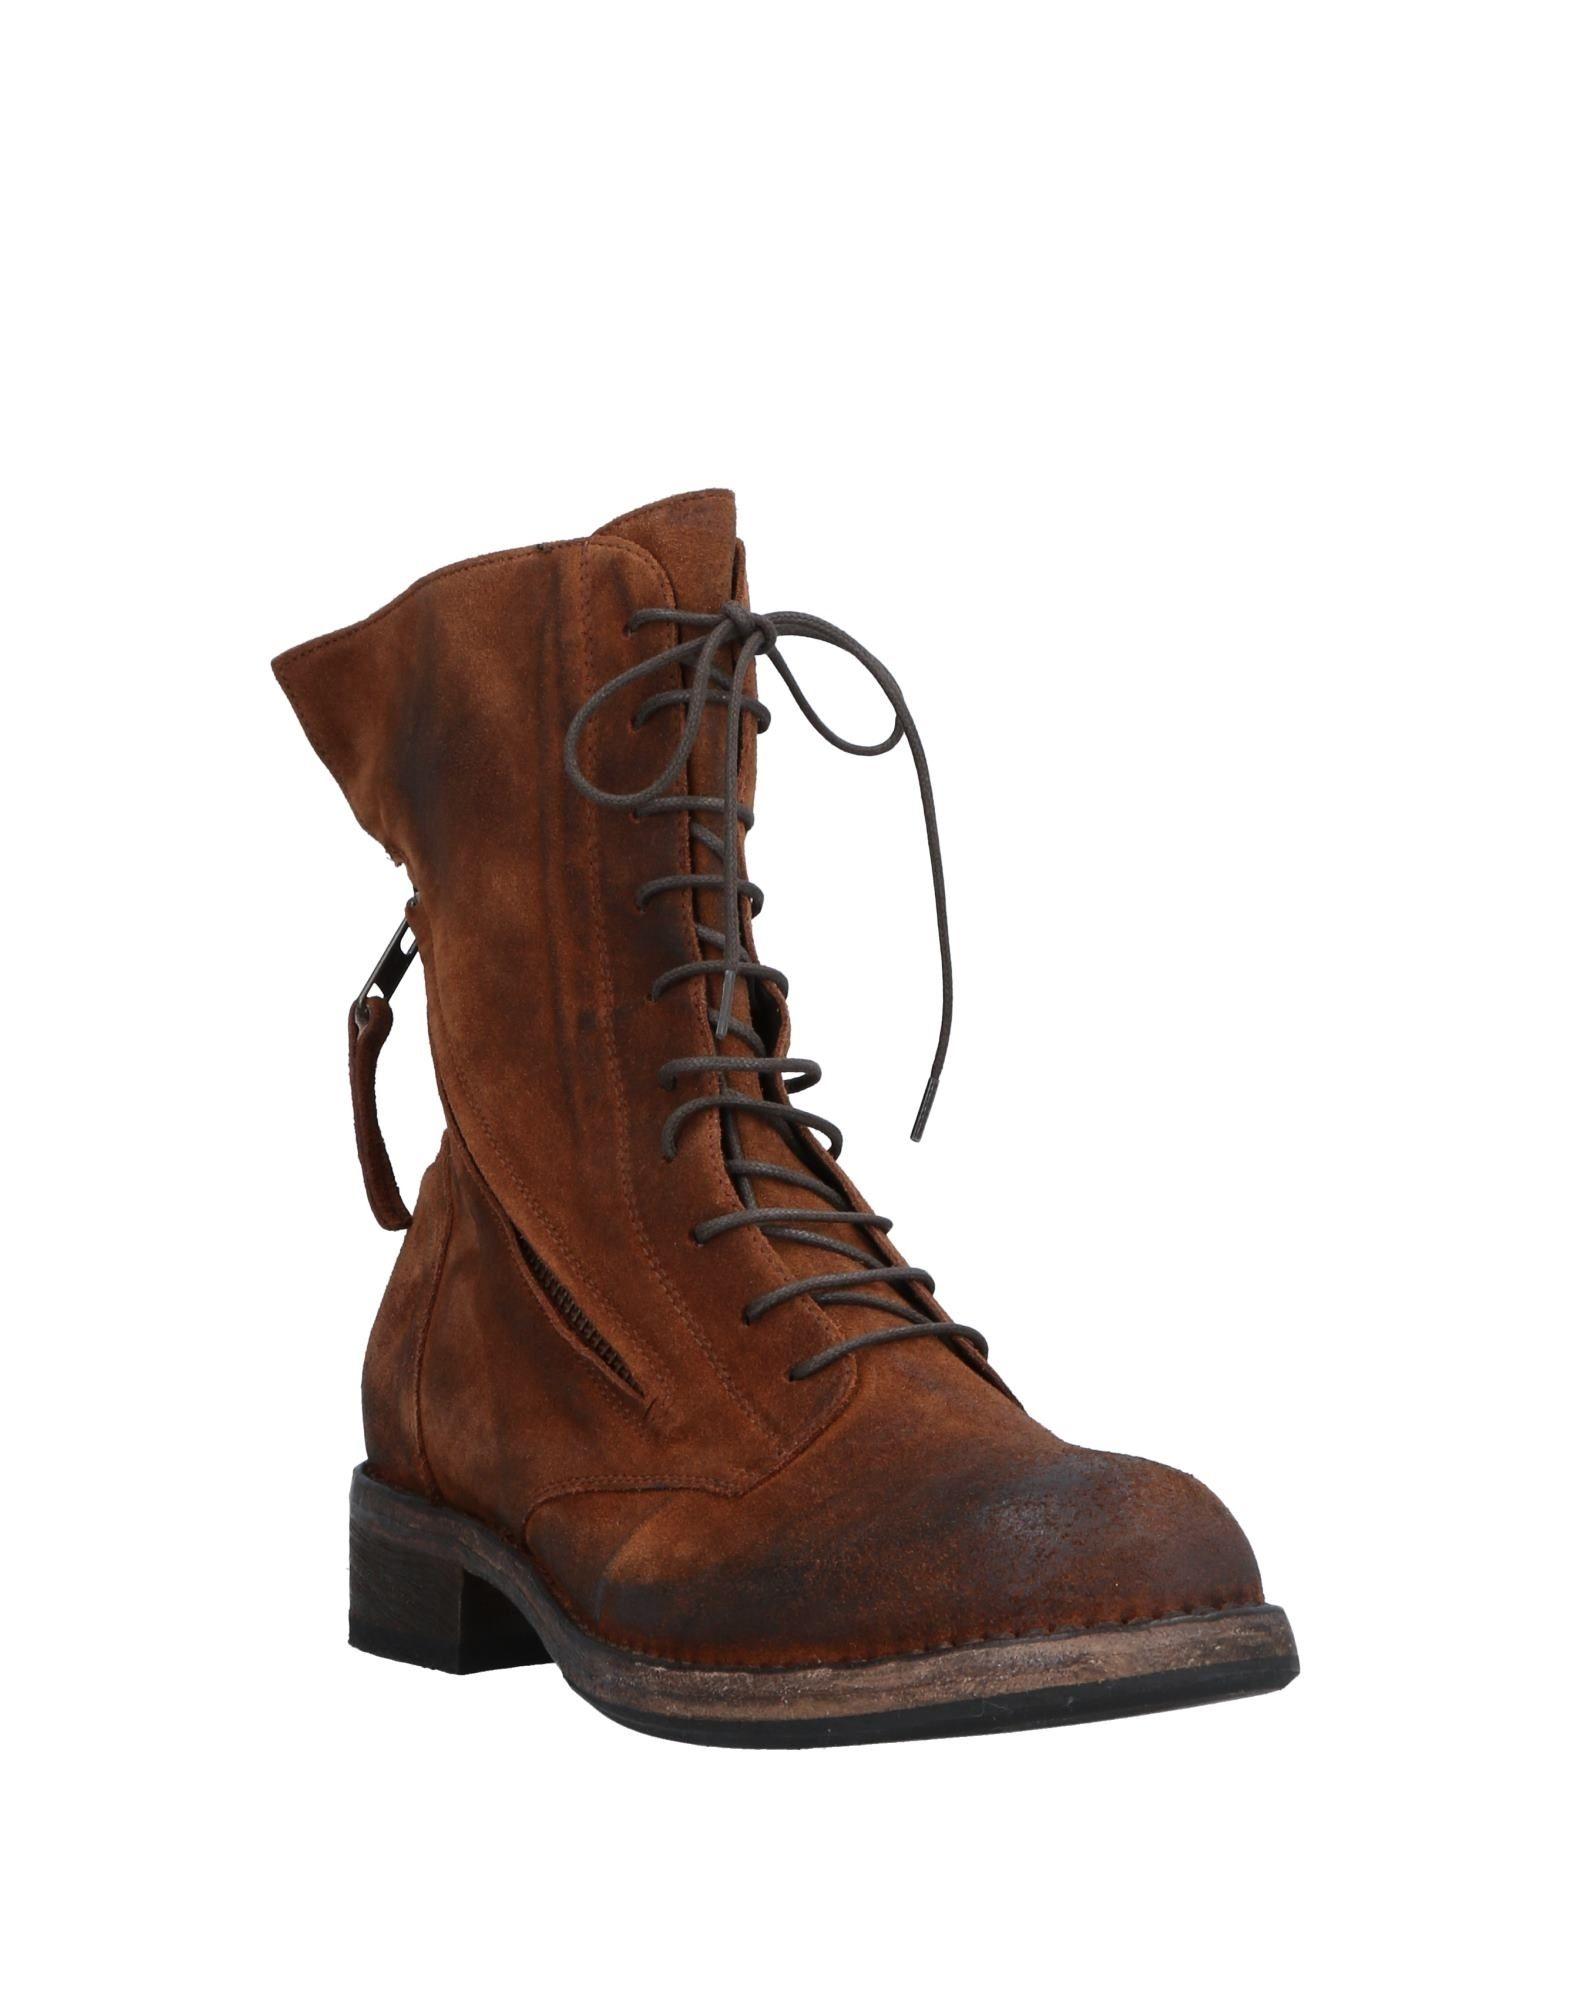 Stilvolle billige Schuhe Le  Qarant Stiefelette Damen  Le 11535586UK 4cece7